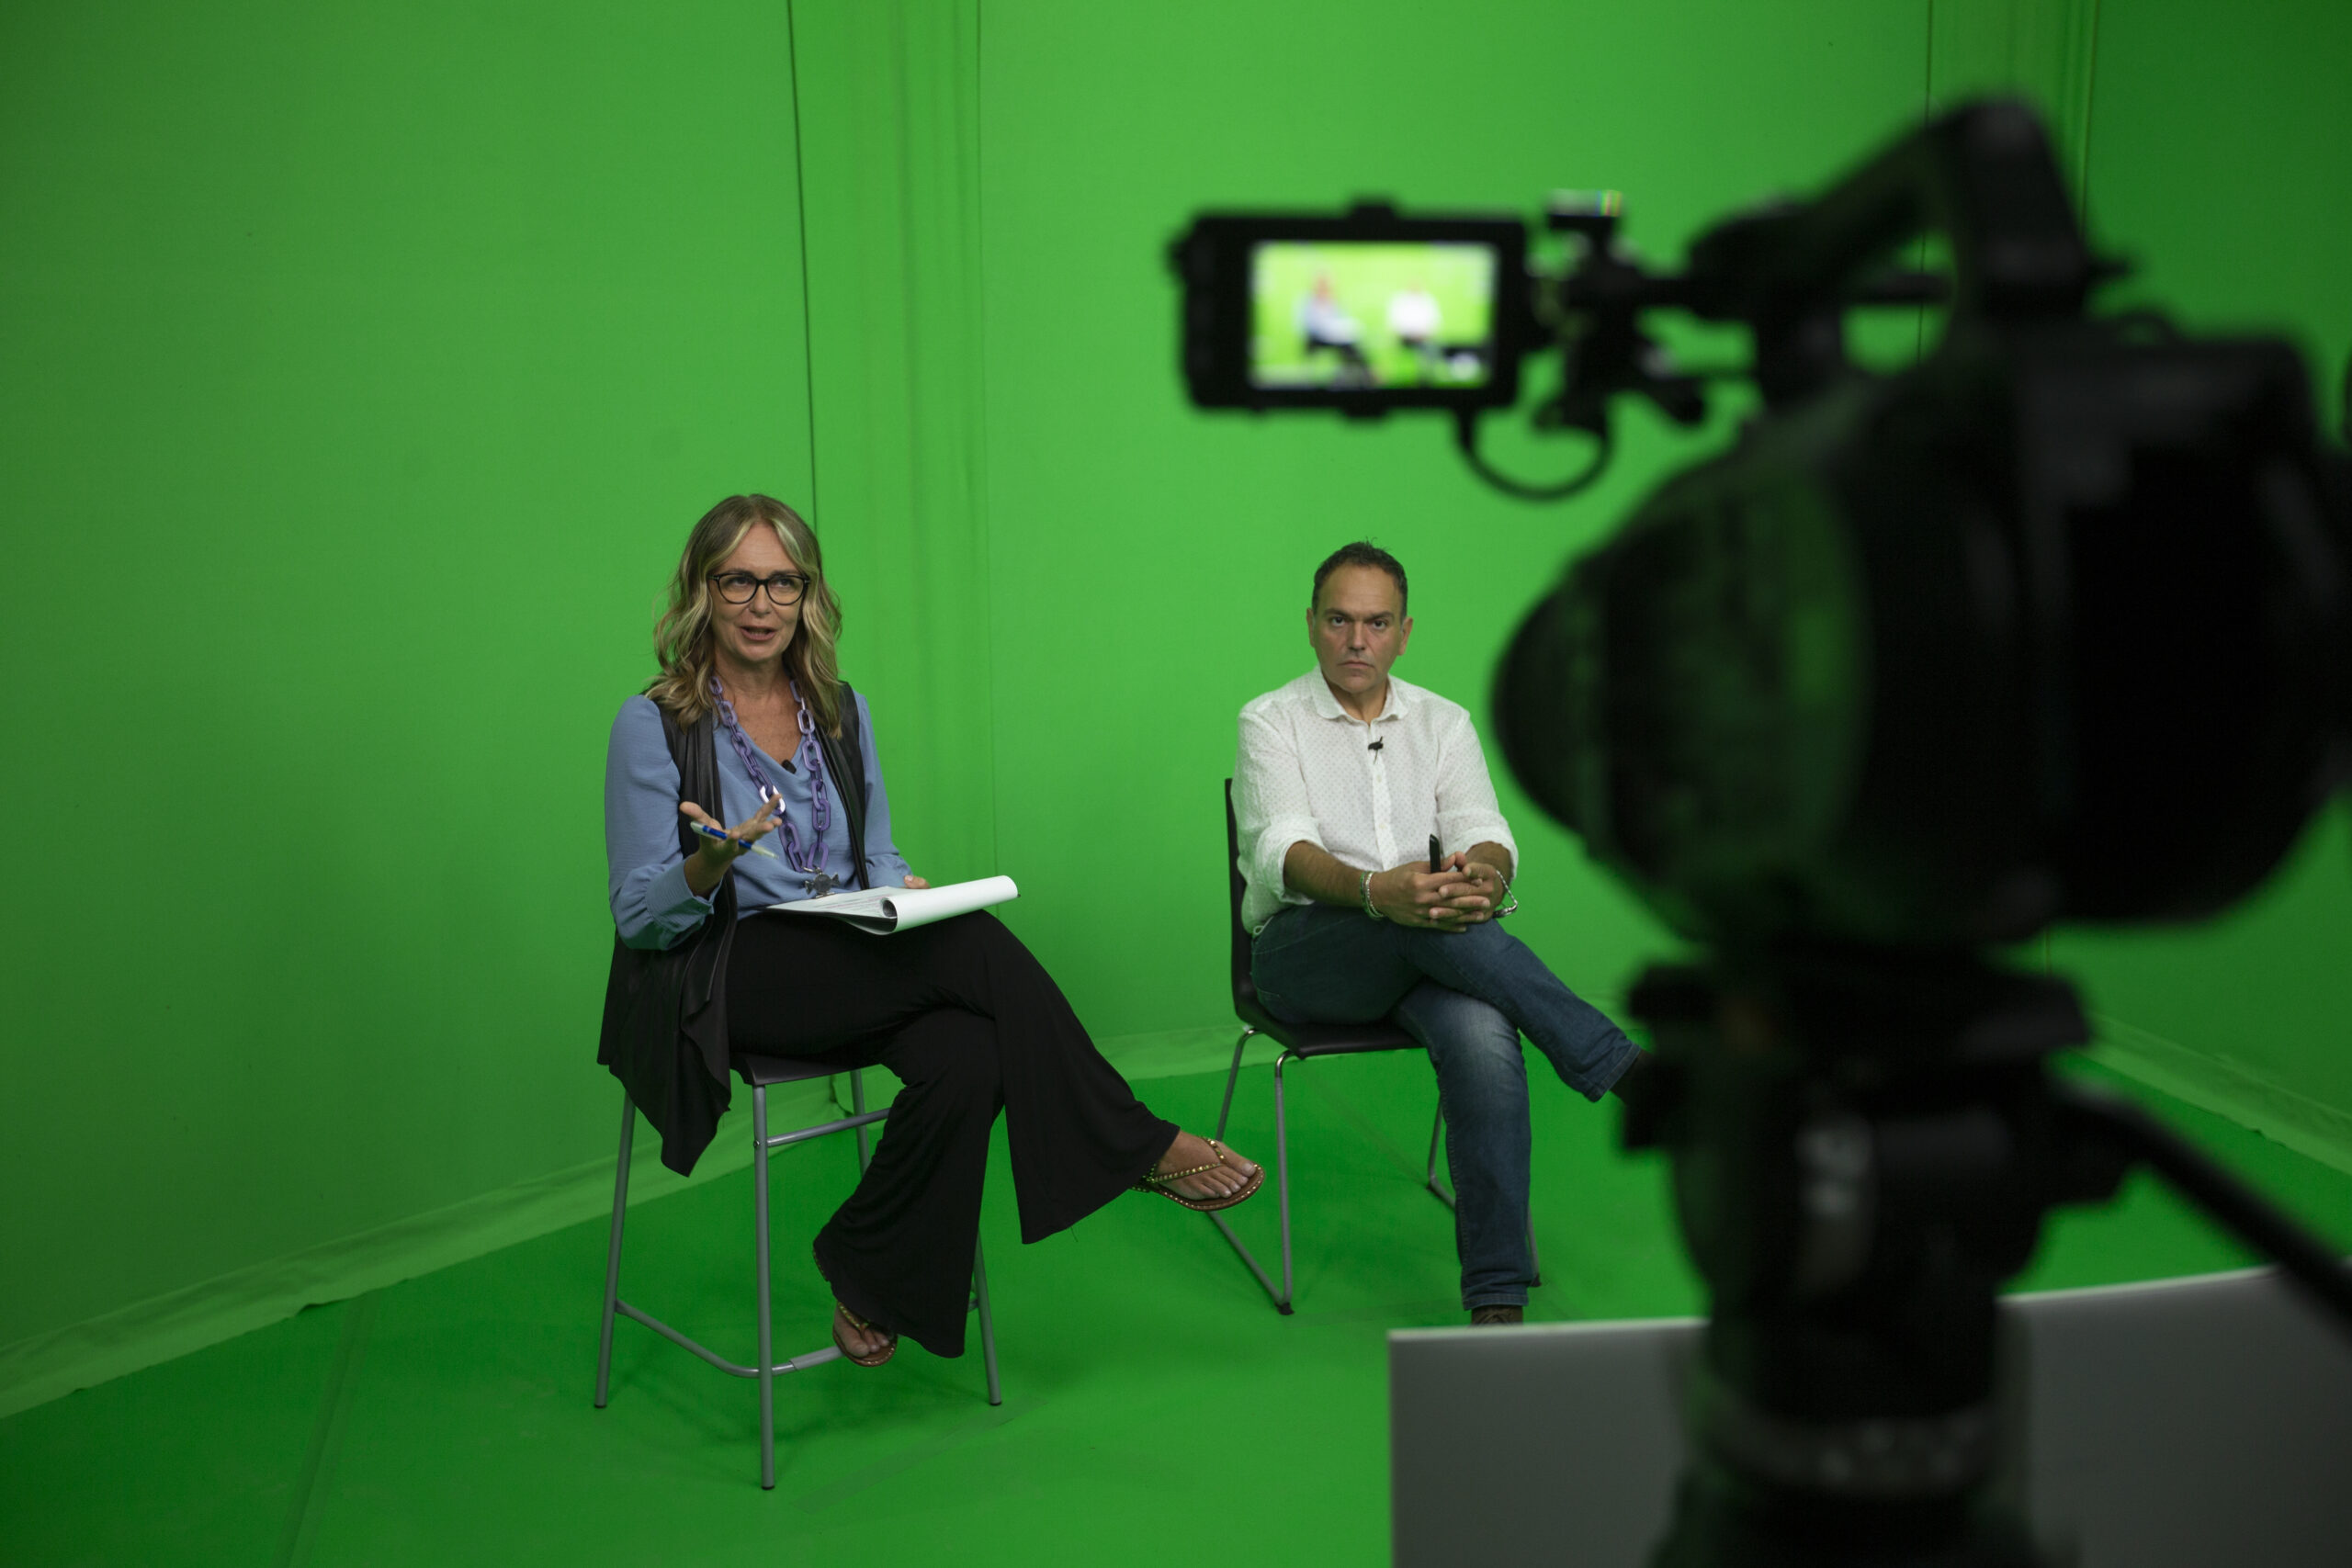 Videomaker Videomnia